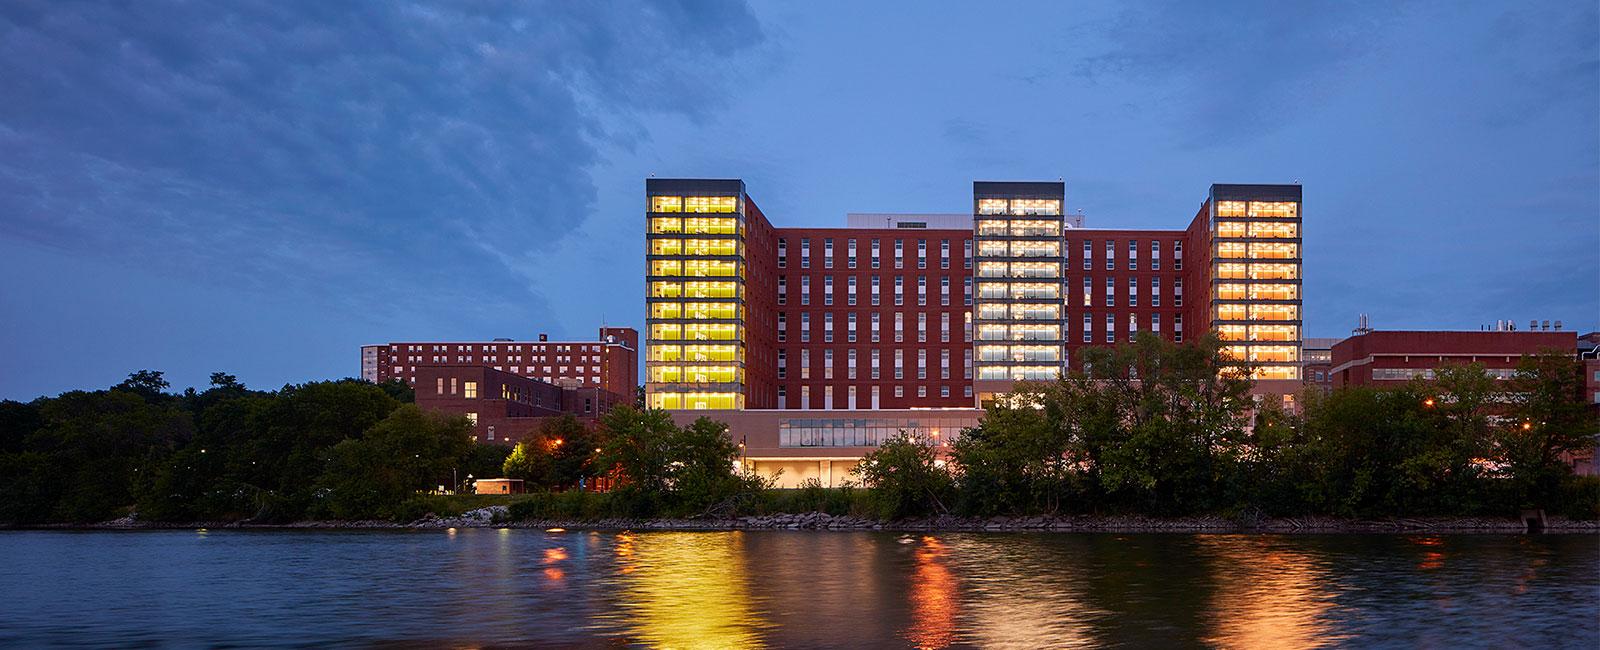 University of Iowa - Elizabeth Catlett Residence Hall